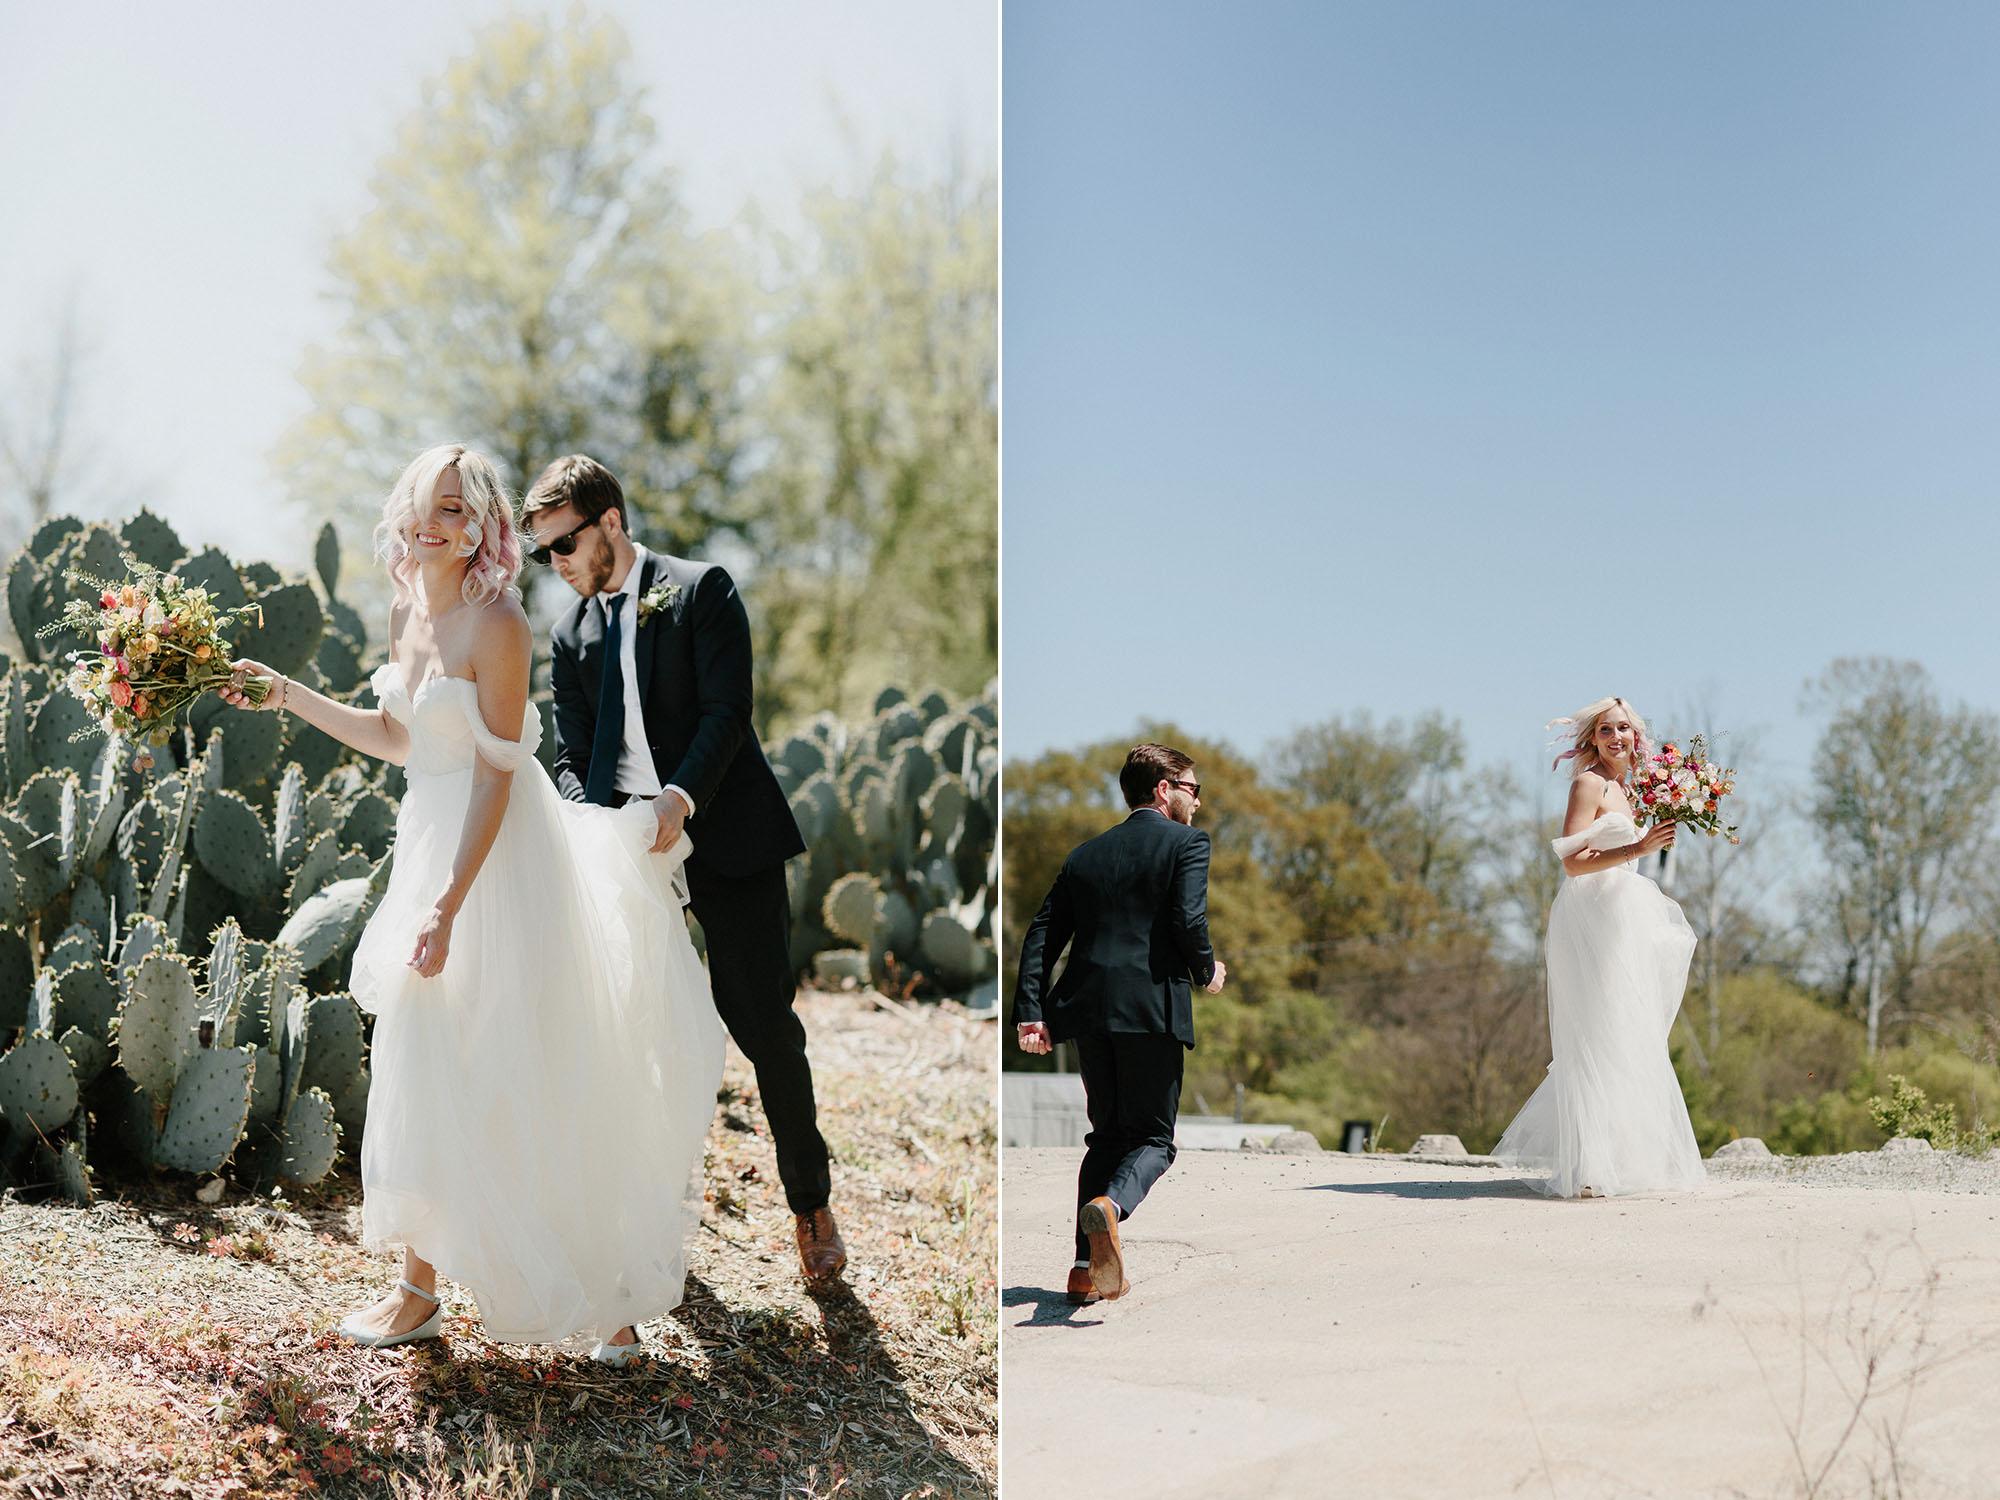 nontraditional-athens-georgia-wedding-photographer-6.jpg